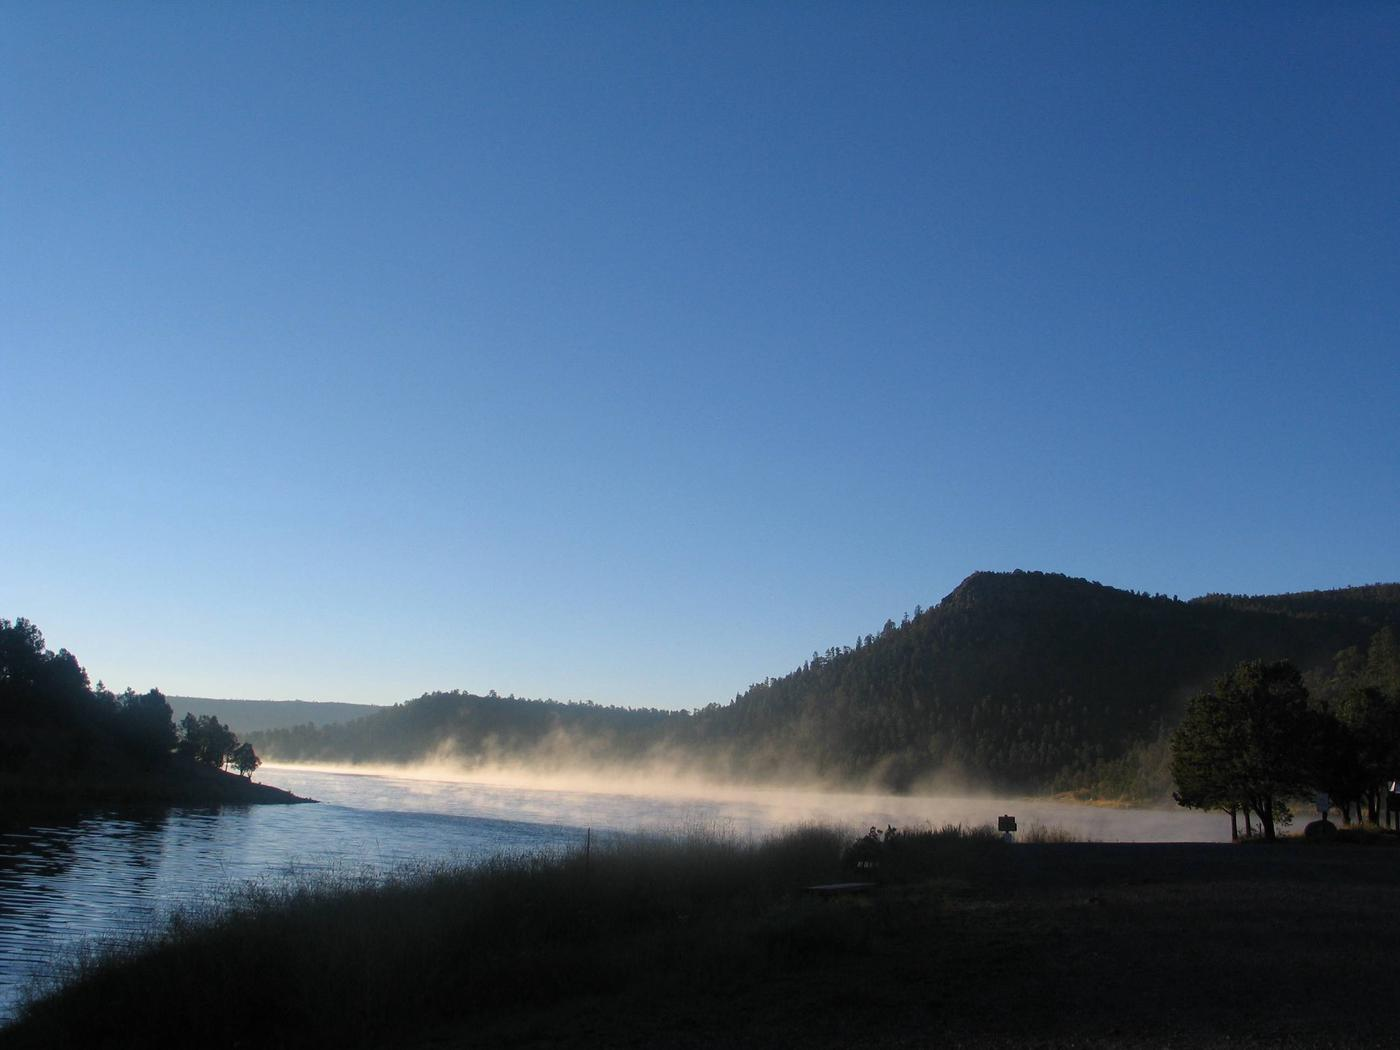 Landscape near Quemado Lake showing mist rising off lake